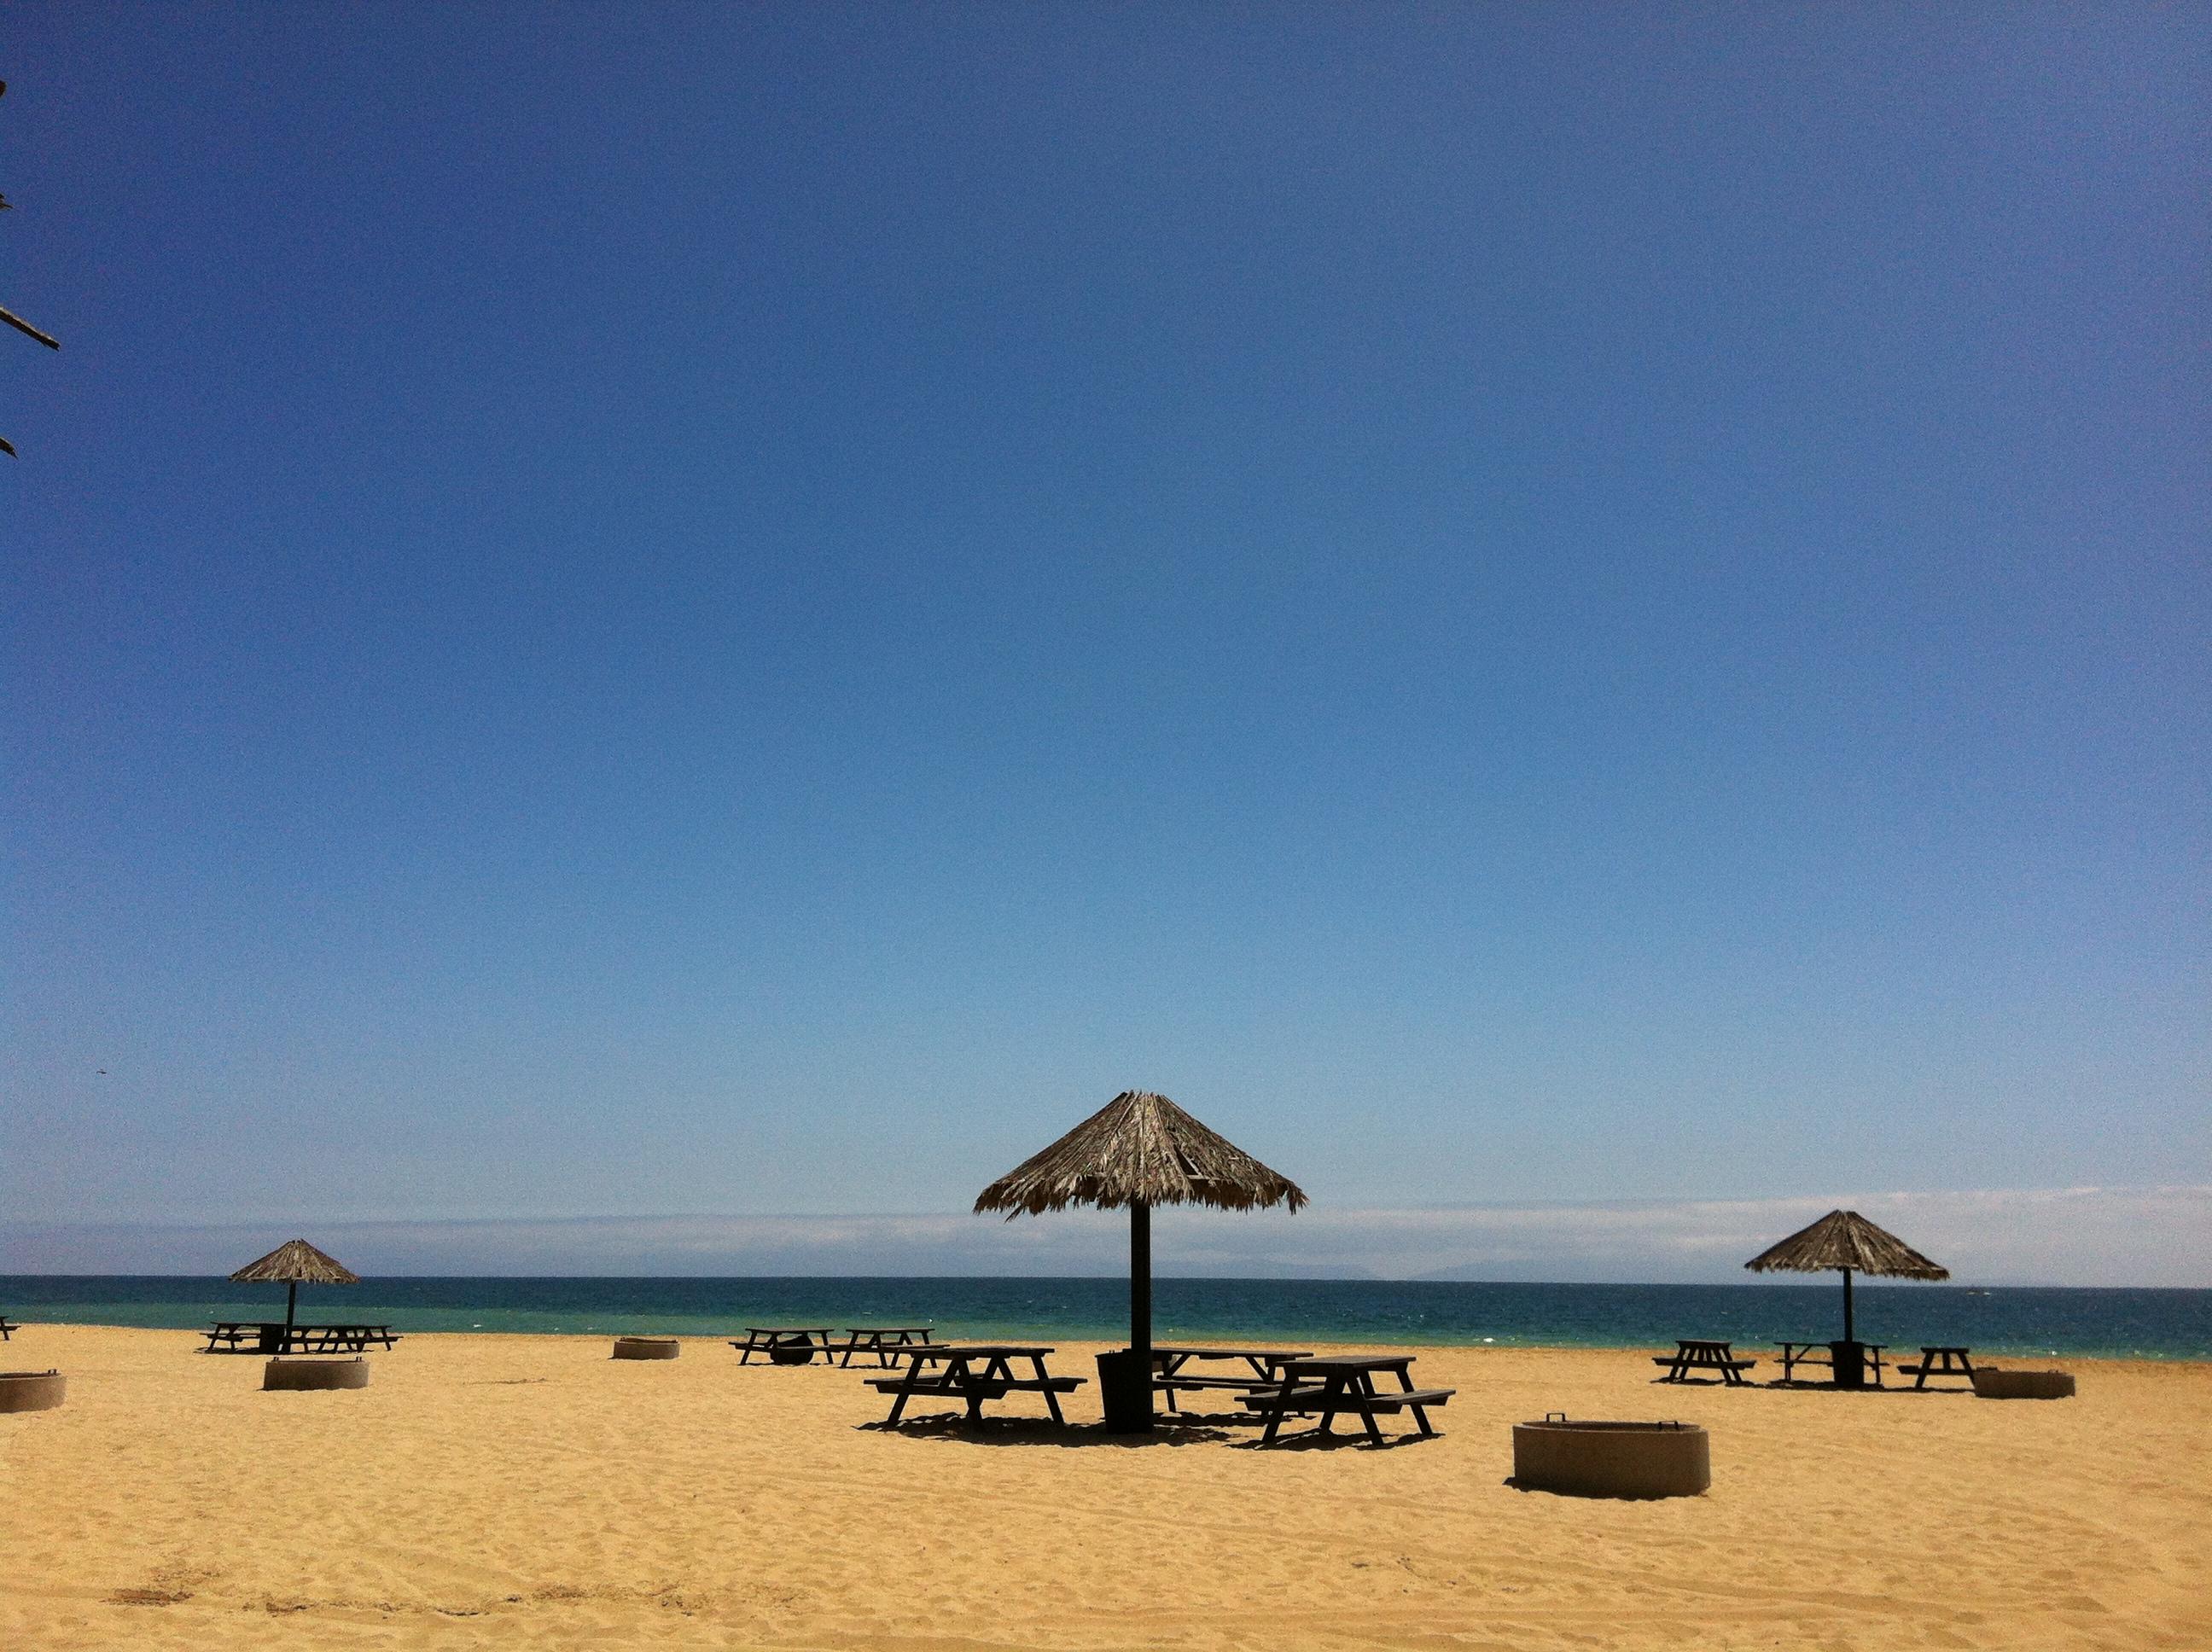 Portuguese Bend BC - Private beach in Palos Verdes